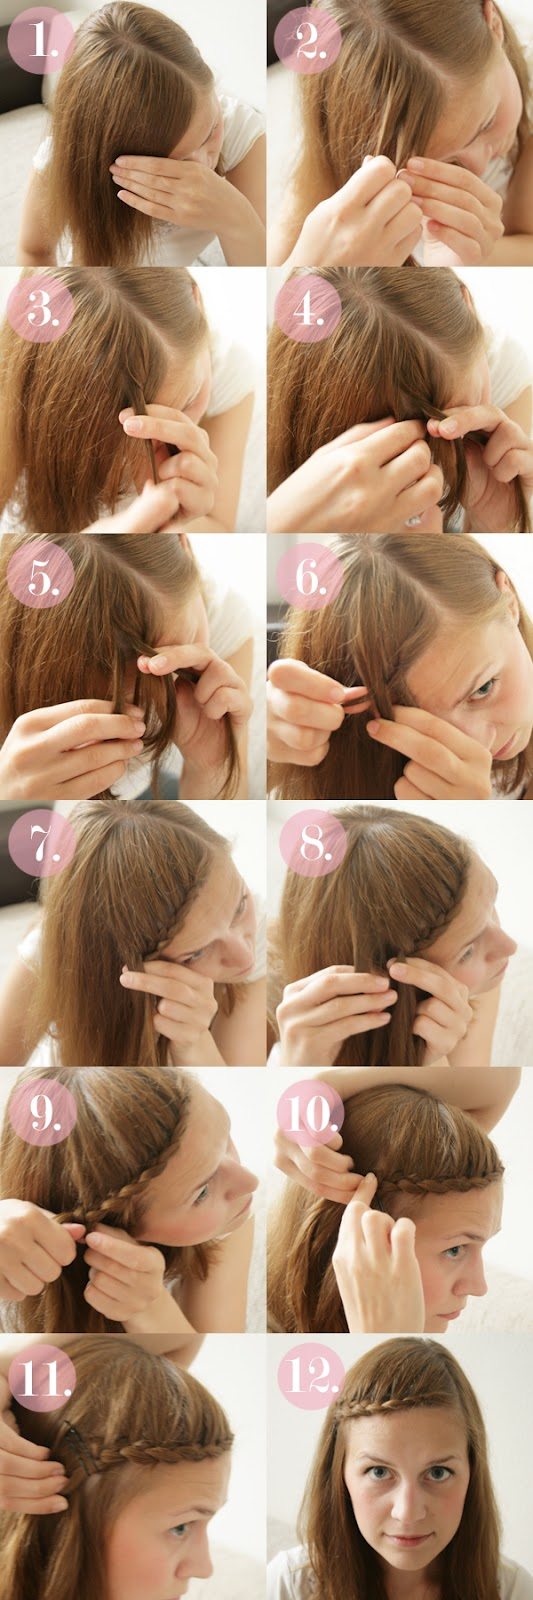 braided bangs tutorial -#main